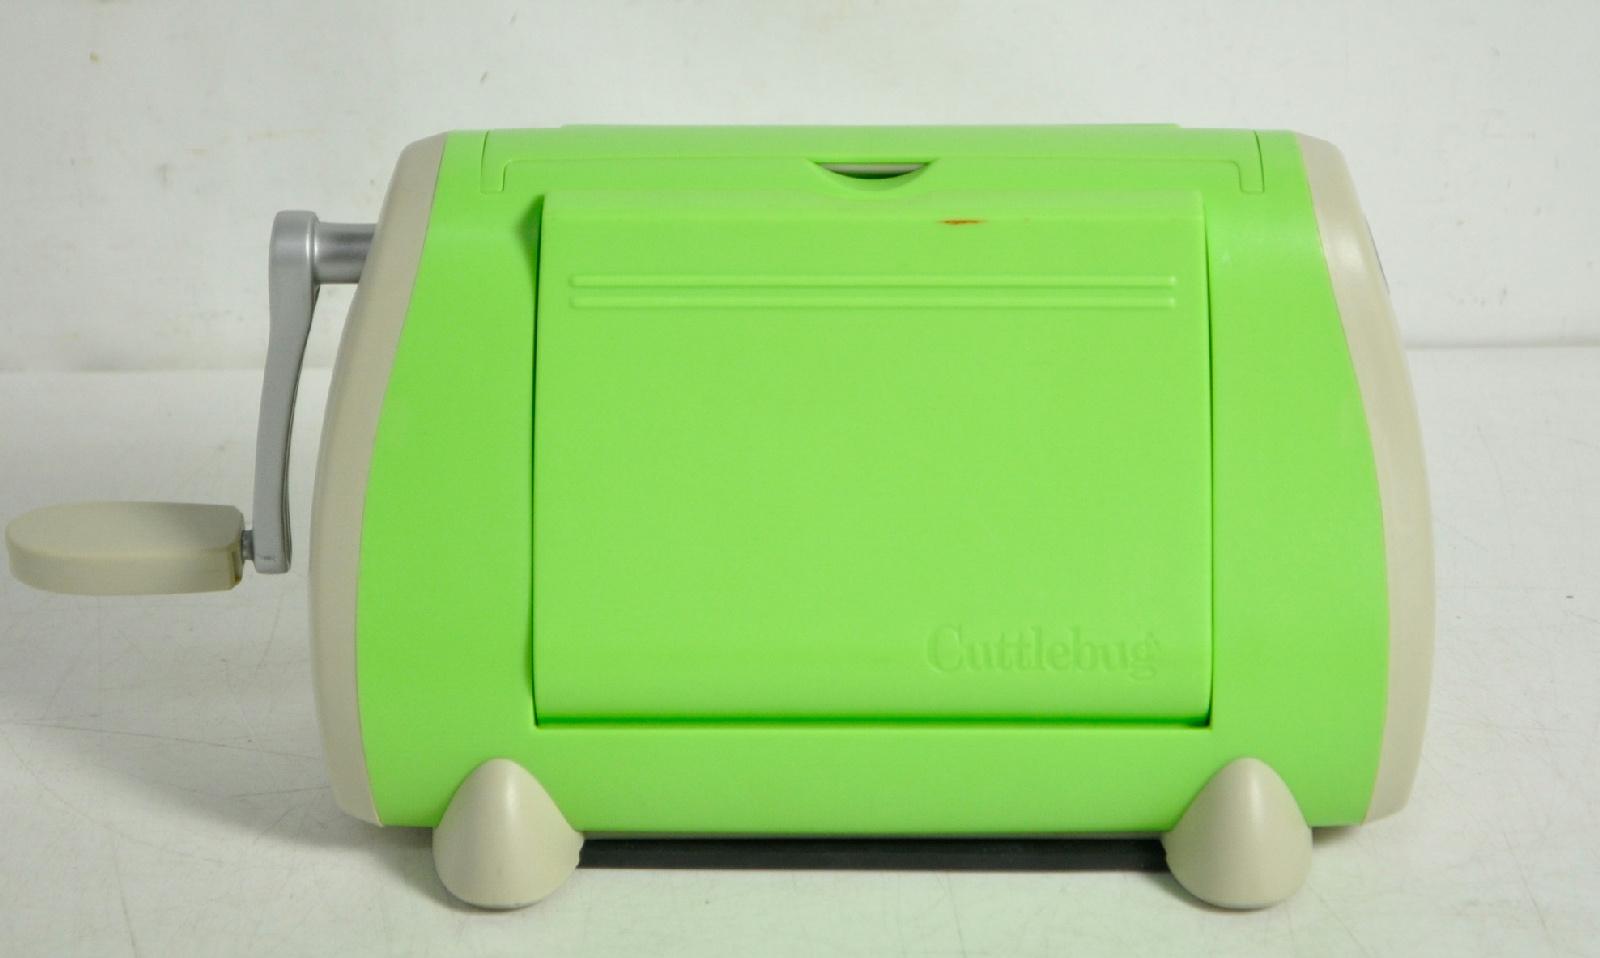 cuttlebug craft machine